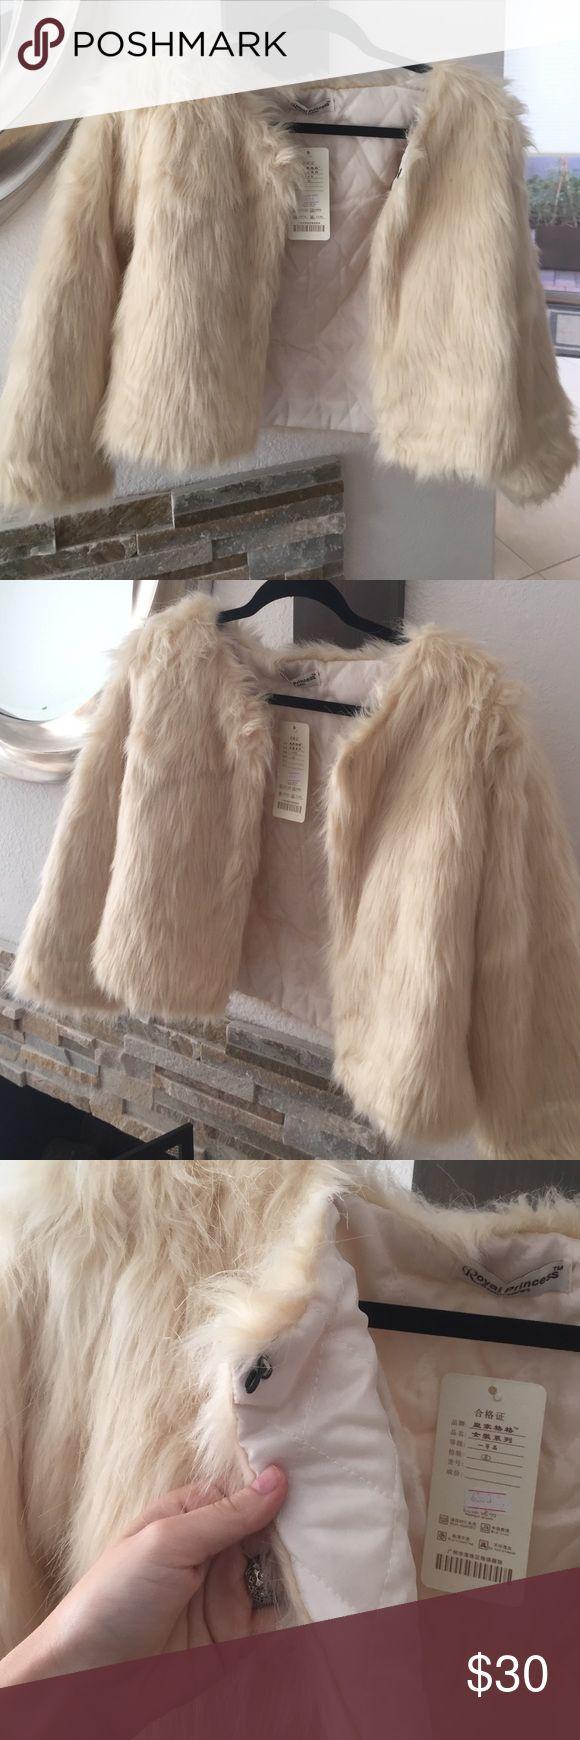 NWT- Faux Fur Crop Jacket NWT Faux Fur Cropped Jacket Jackets & Coats